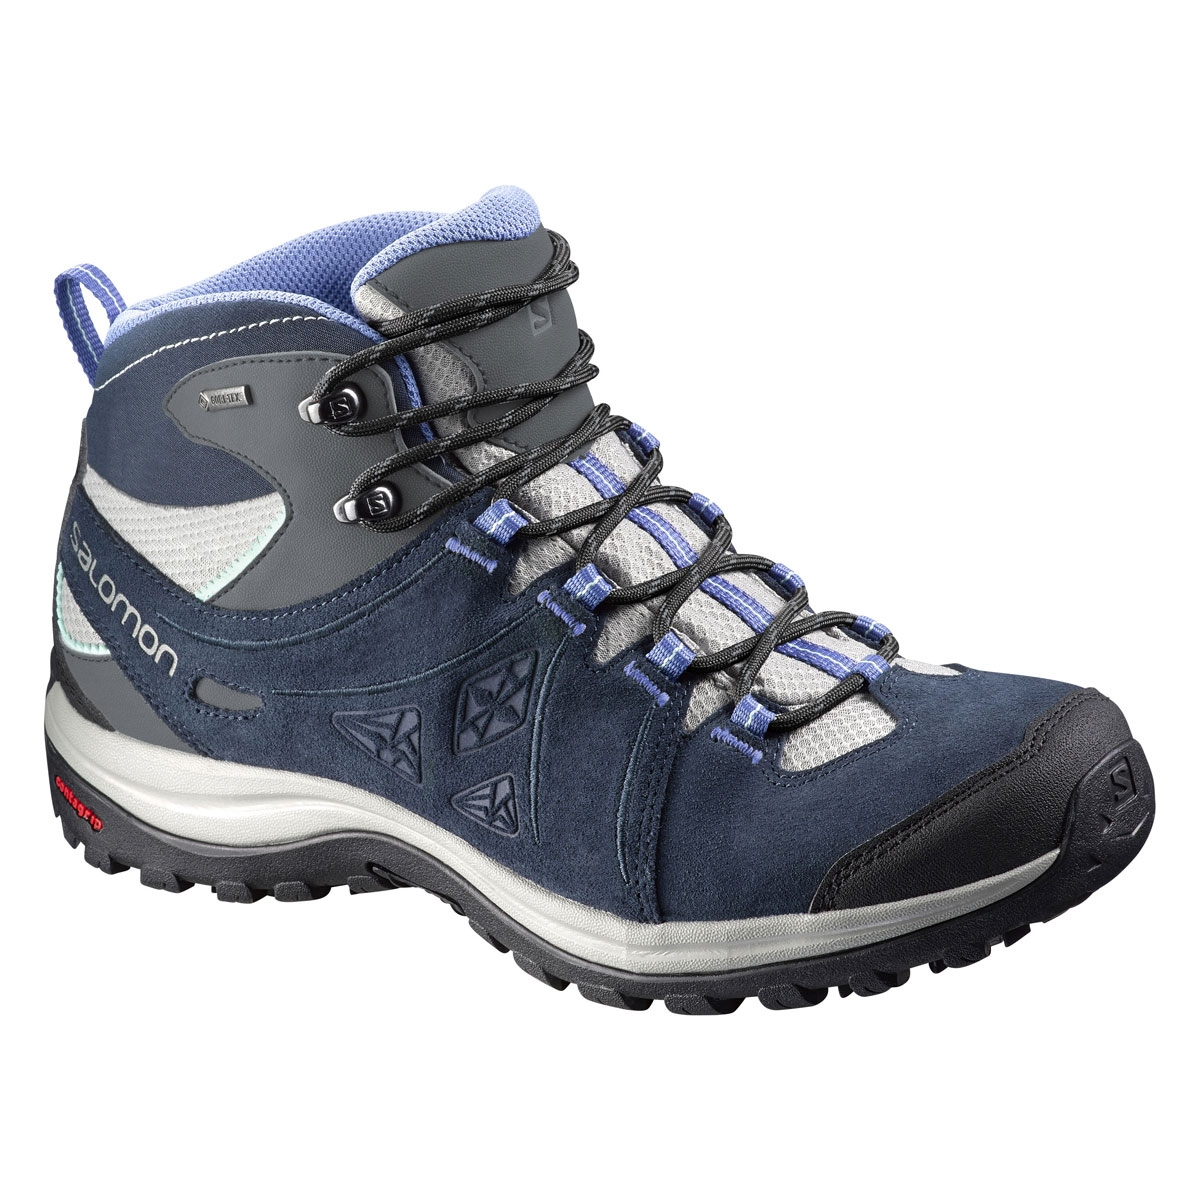 ... Deep Blue / Petunia Blue. Image of Salomon Ellipse 2 Mid LTR GTX Lady Walking  Boots (Women's) - Titanium